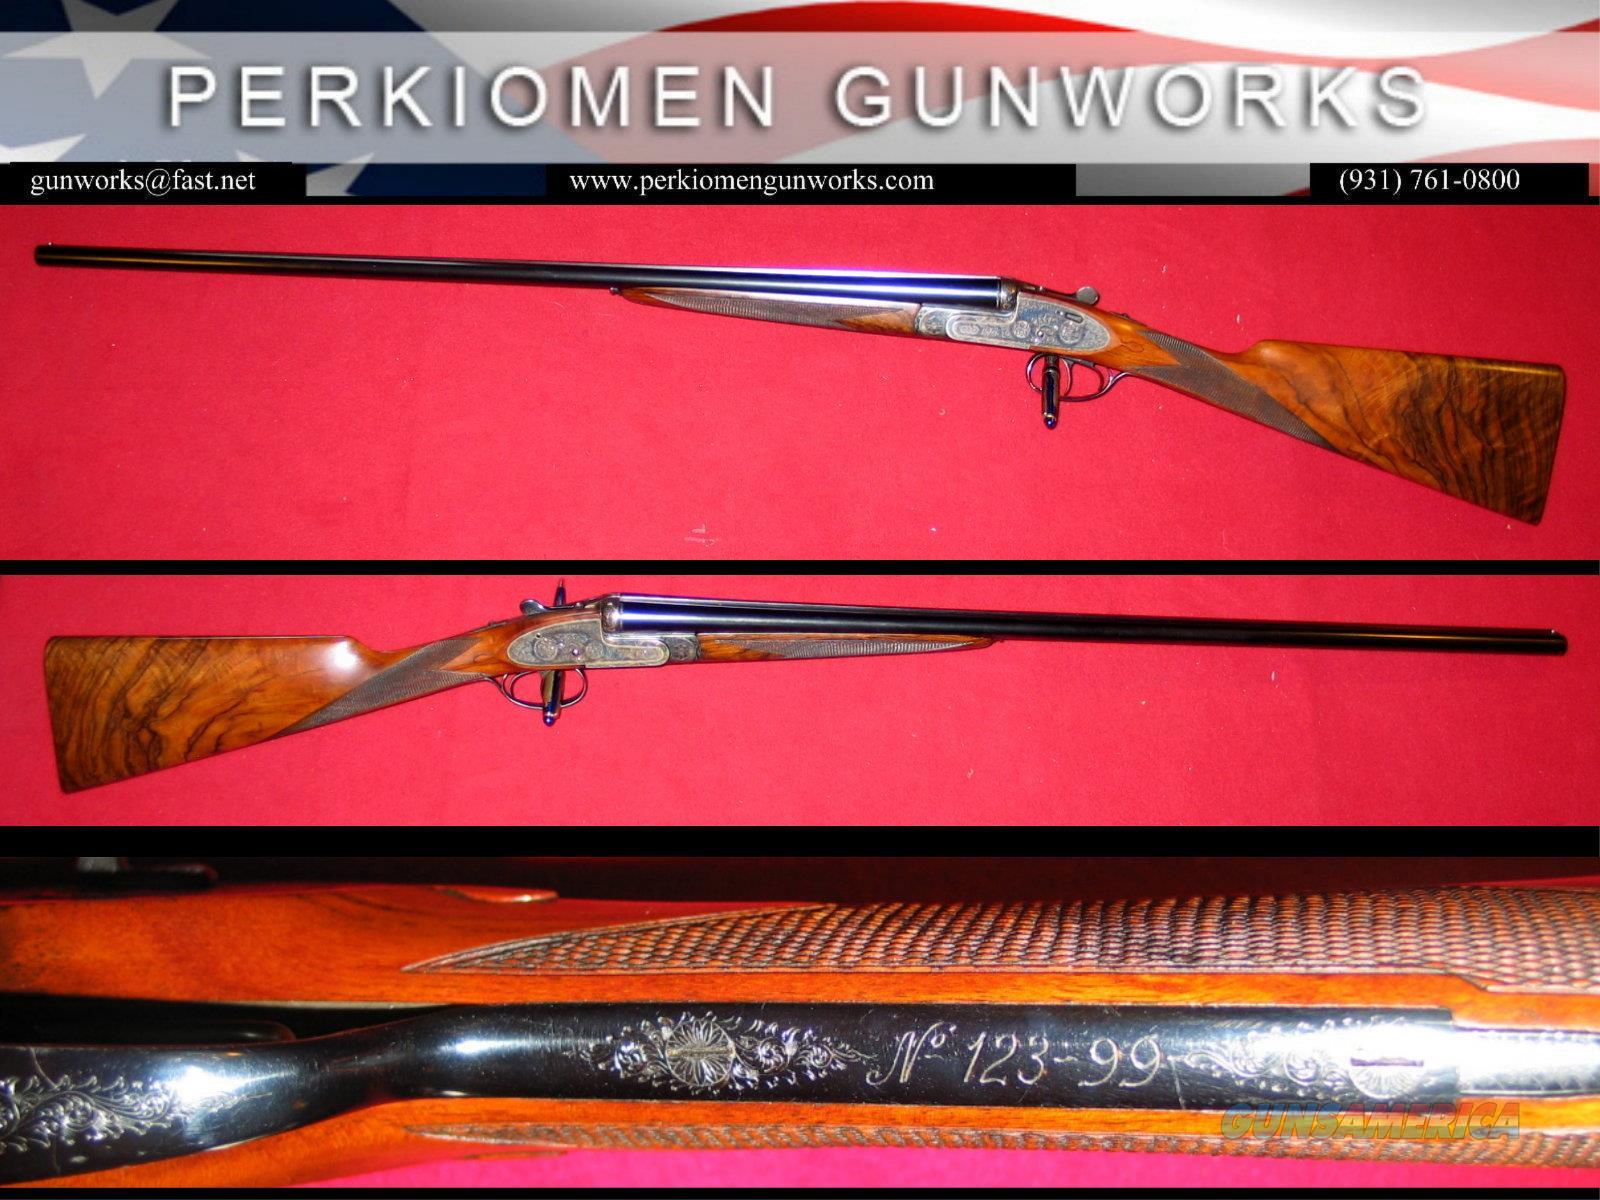 Armas Garbi Model 103A SxS sidelock 28ga shotgun, 29 inch IC/Mod  Guns > Shotguns > Garbi Shotguns